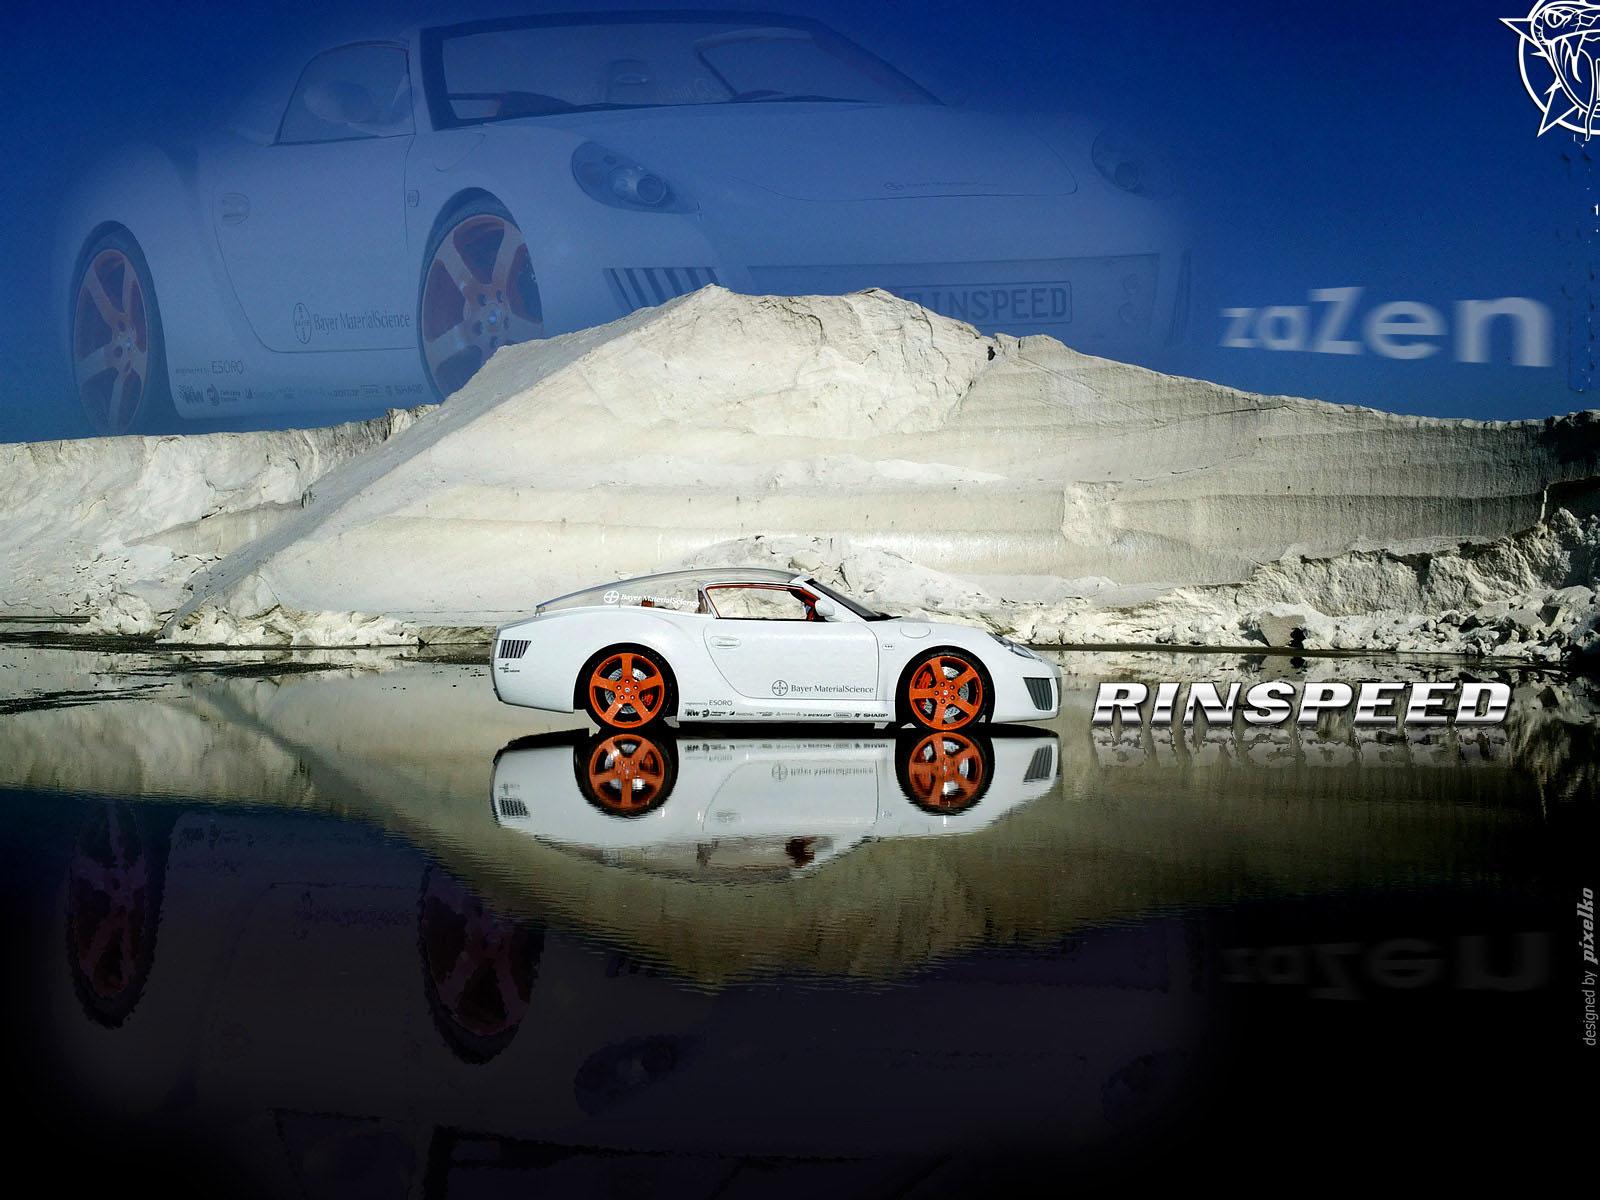 Rin speed mega